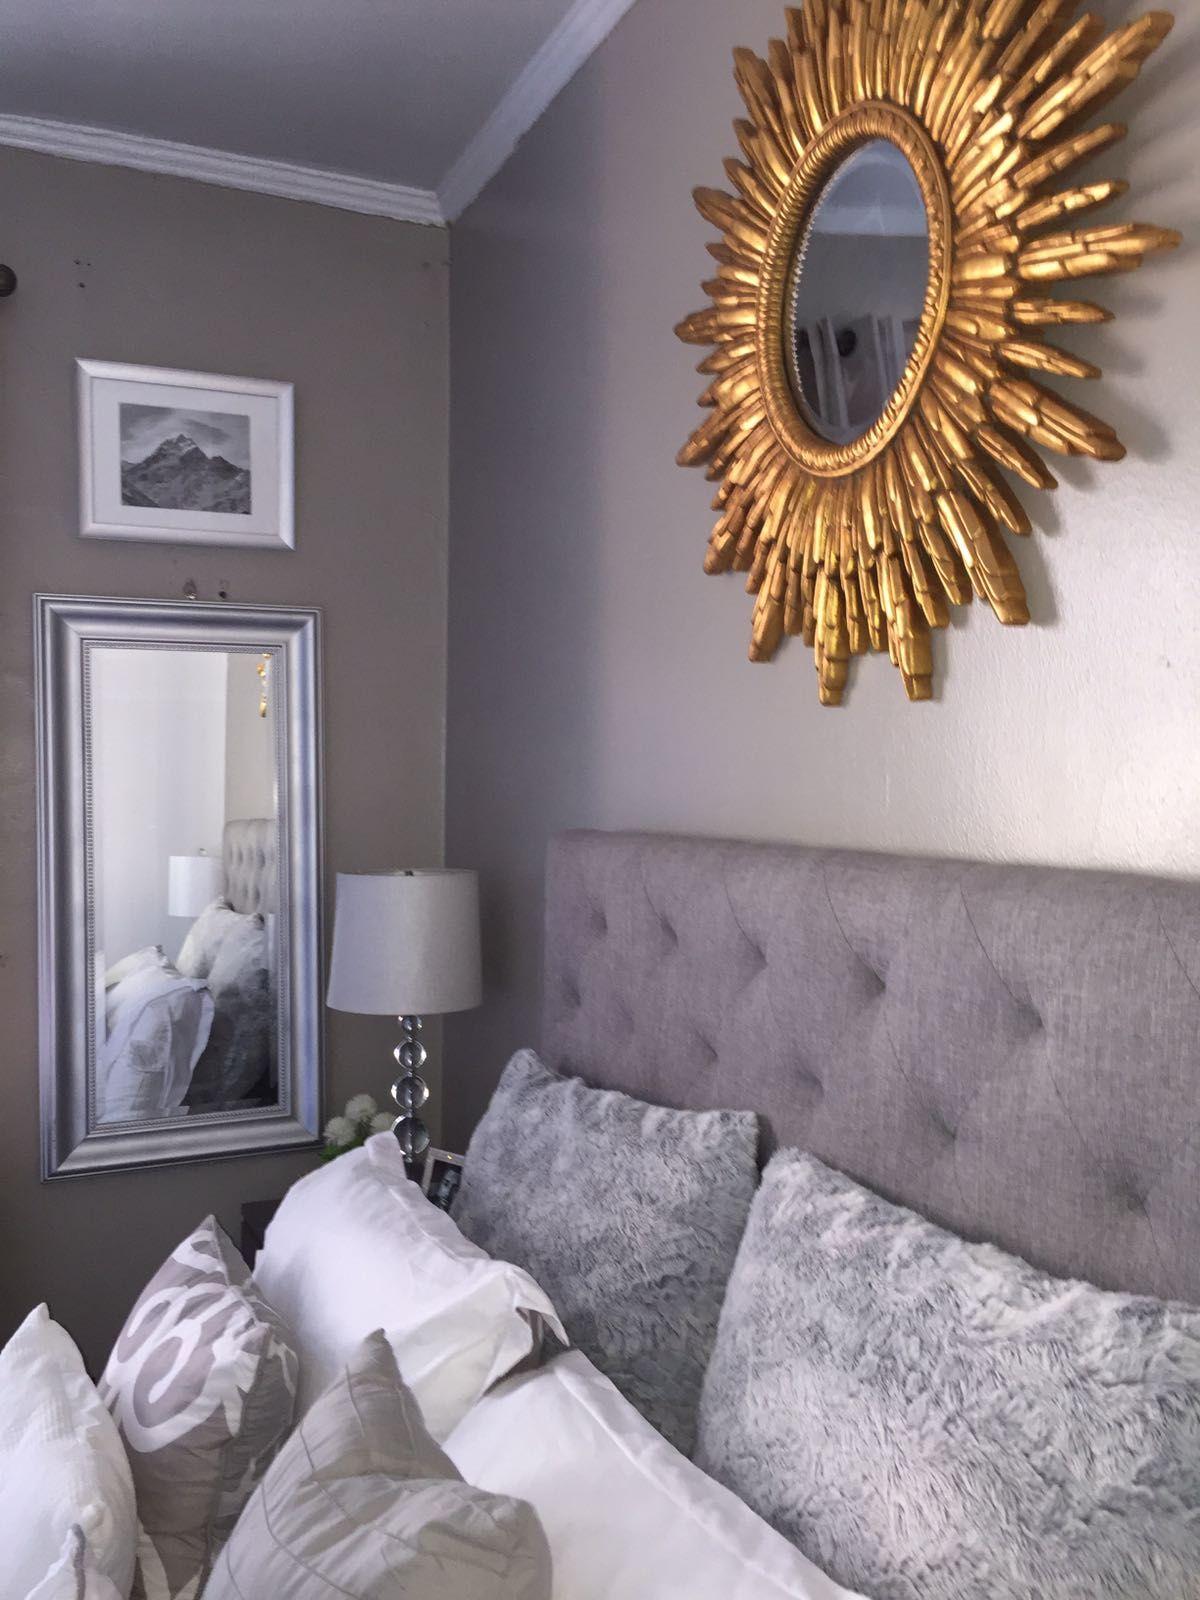 Grey And Gold Bedroom Decoration Decor Headboard Sunburst Mirror